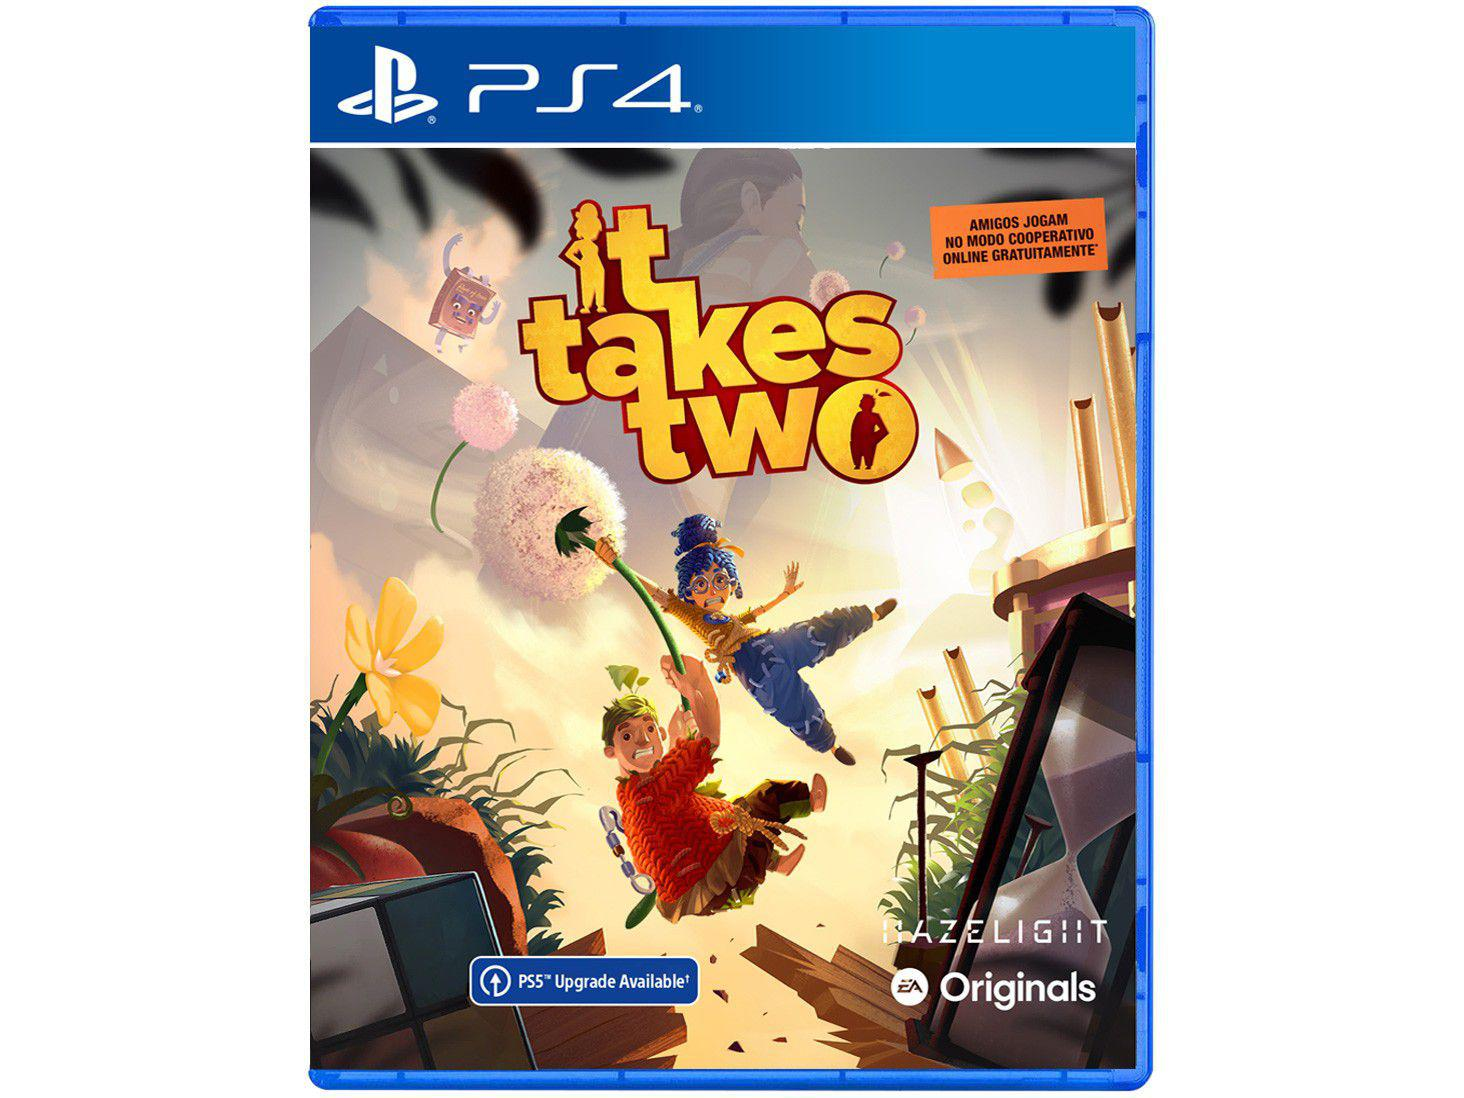 Jogo It Takes Two para PS4 e PS5 Via Upgrade - Digital Hazelight